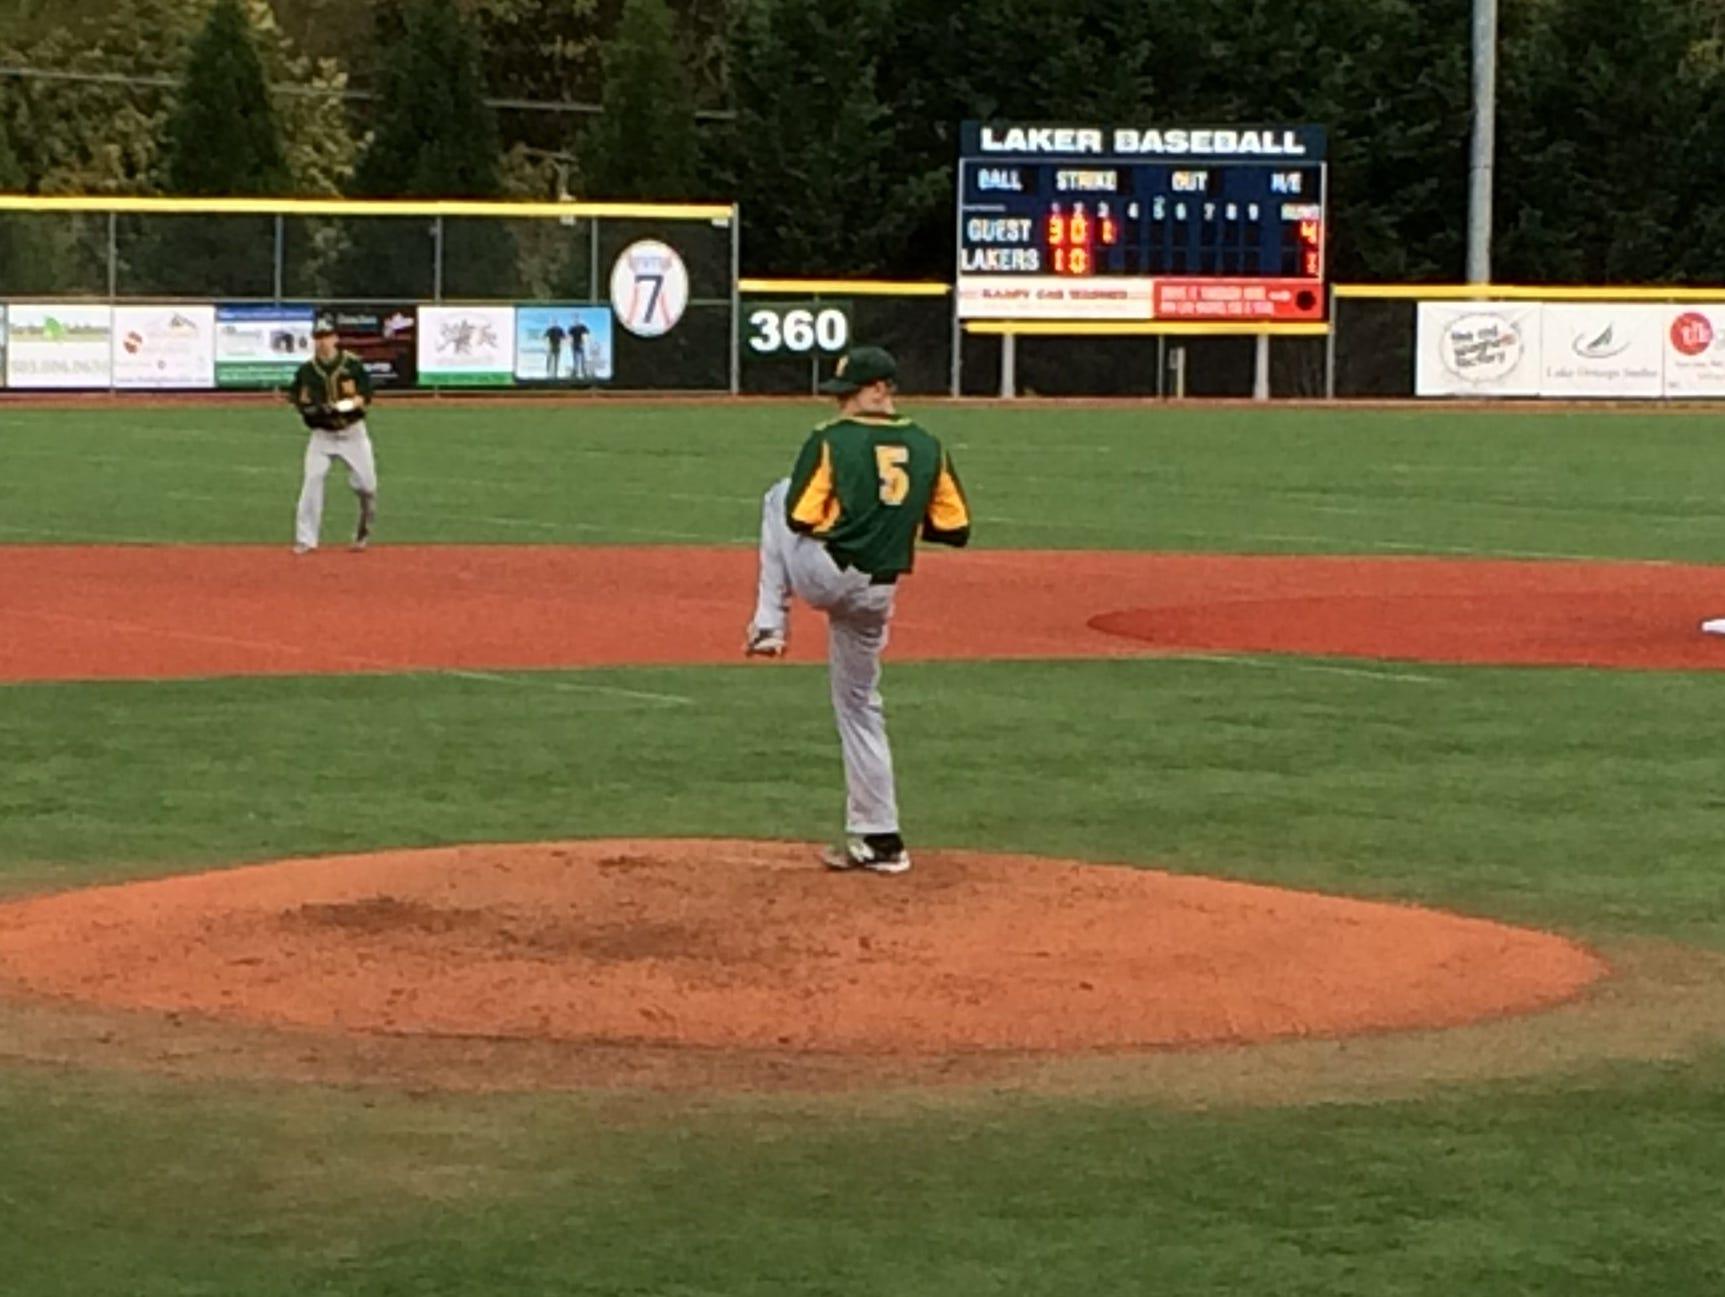 West Linn's Karsen Lindell delivers a pitch against Lake Oswego